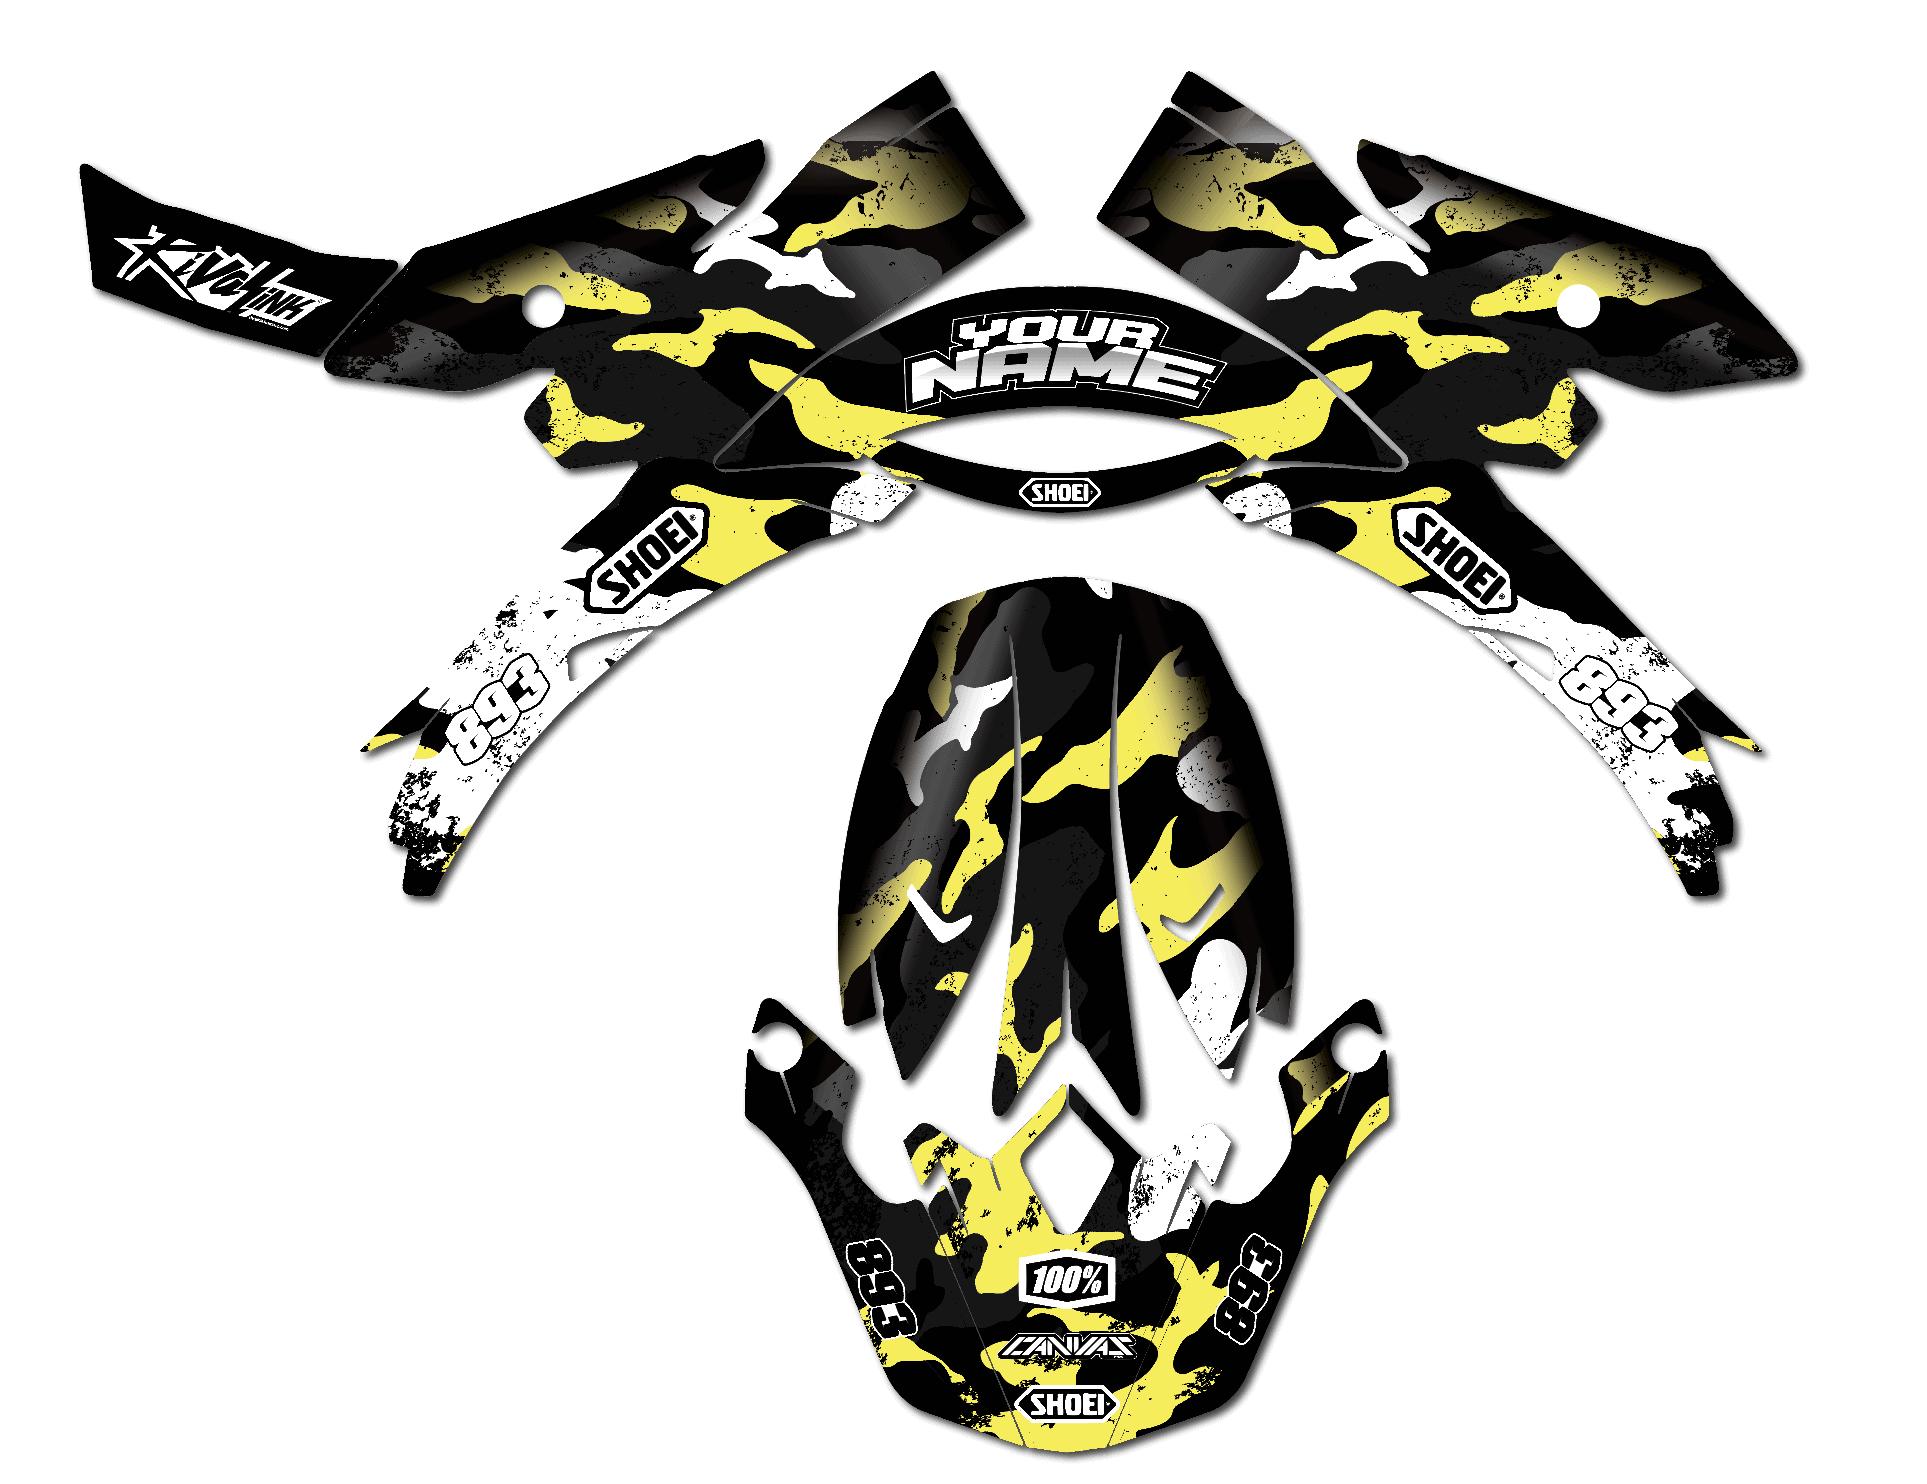 Neon yellow kit rival ink design co custom motocross graphics - Camo Grunge V2 Yellow